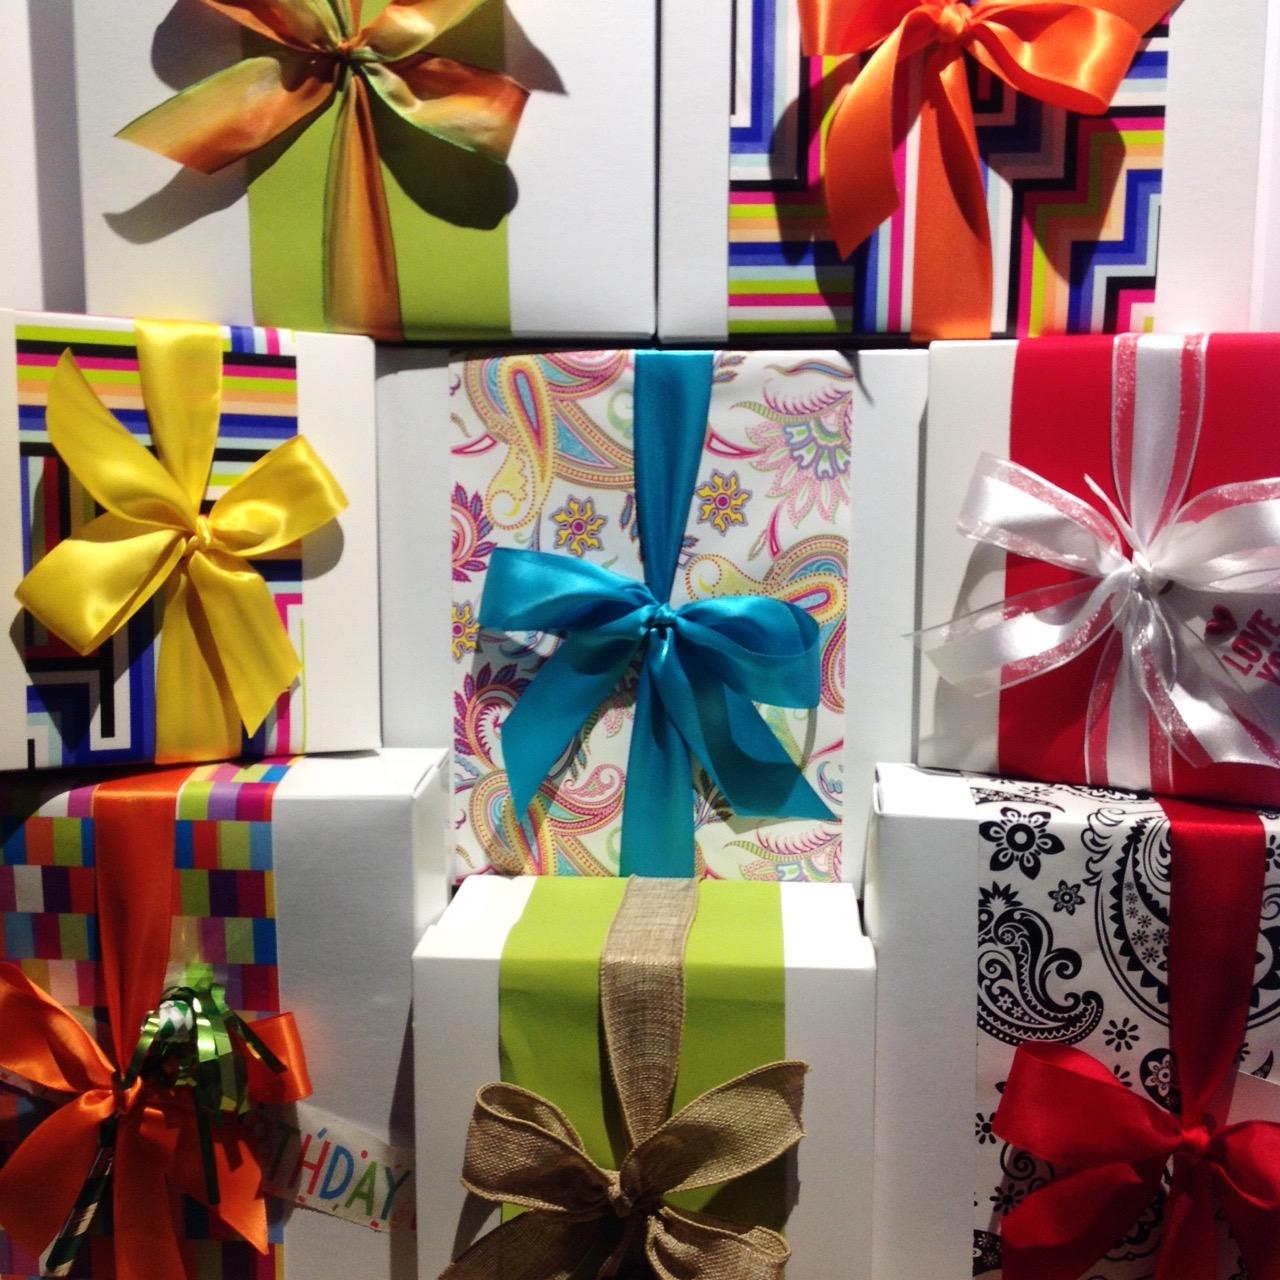 present-los-altos-gift-store-custom-gift-boxes.JPG